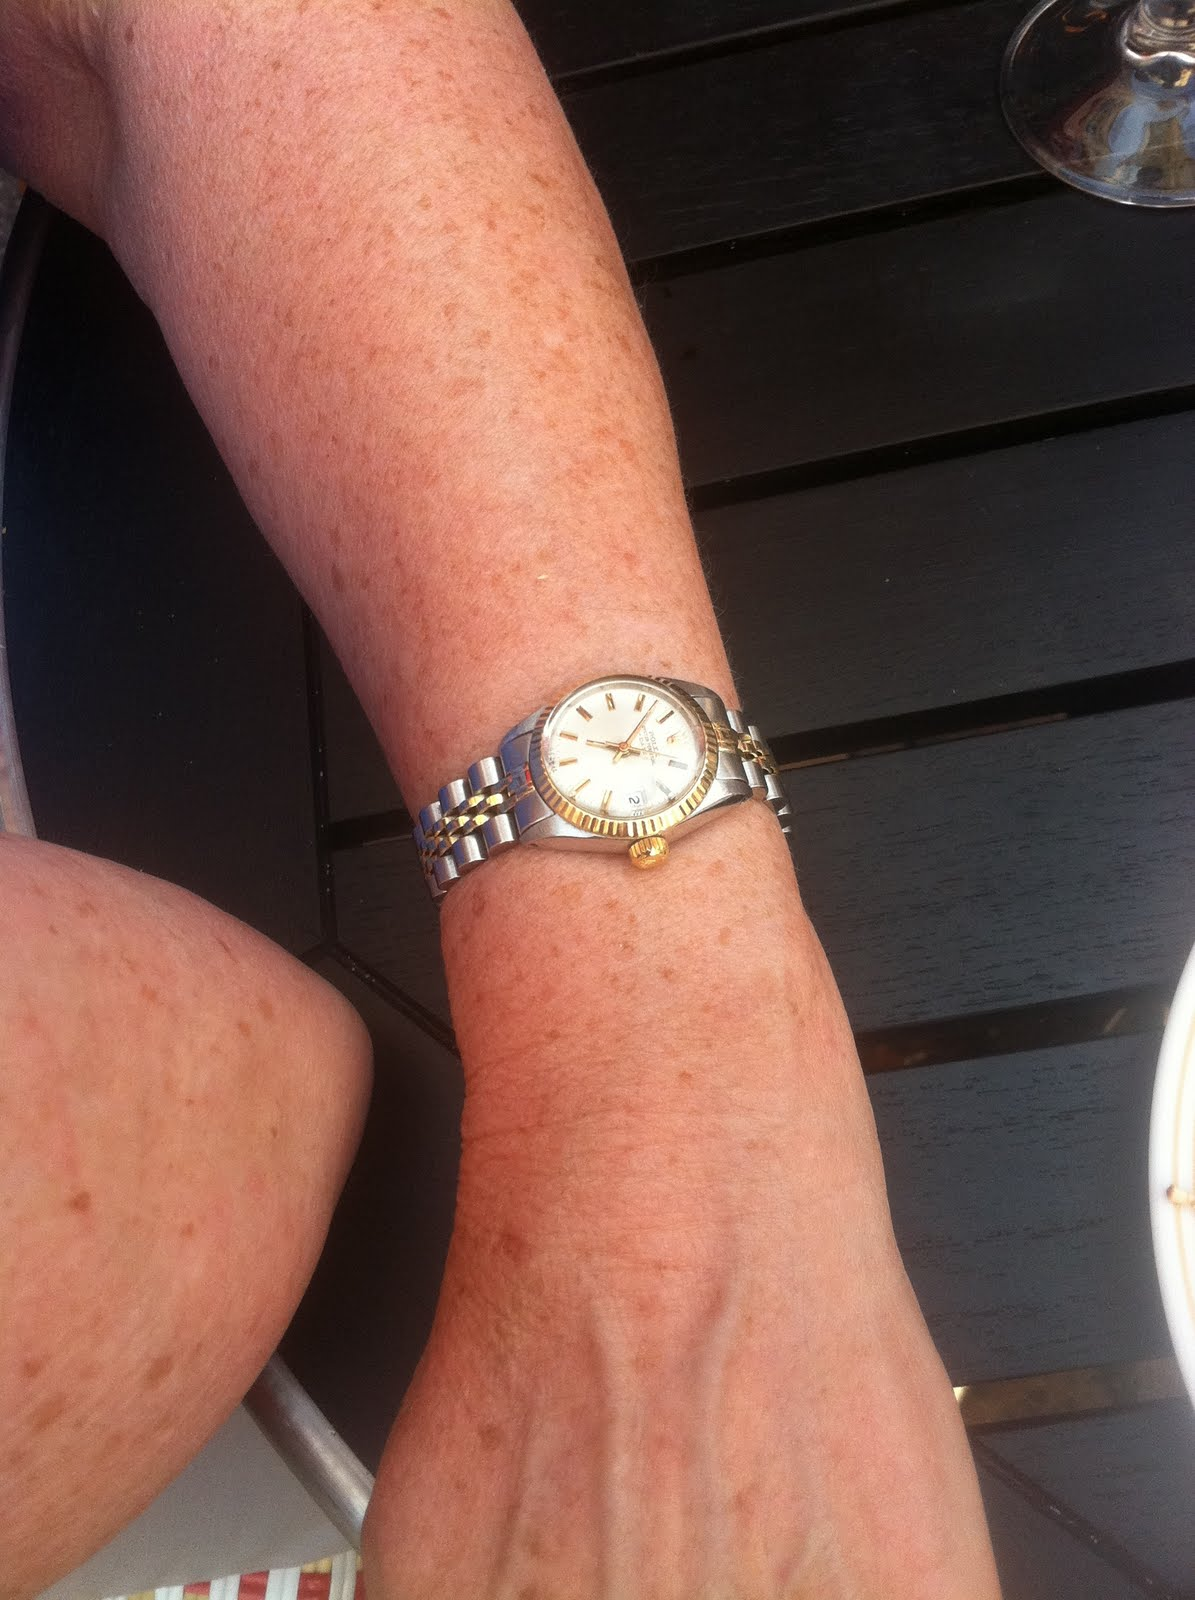 Montre Rolex Femme Or Rose Et Acier